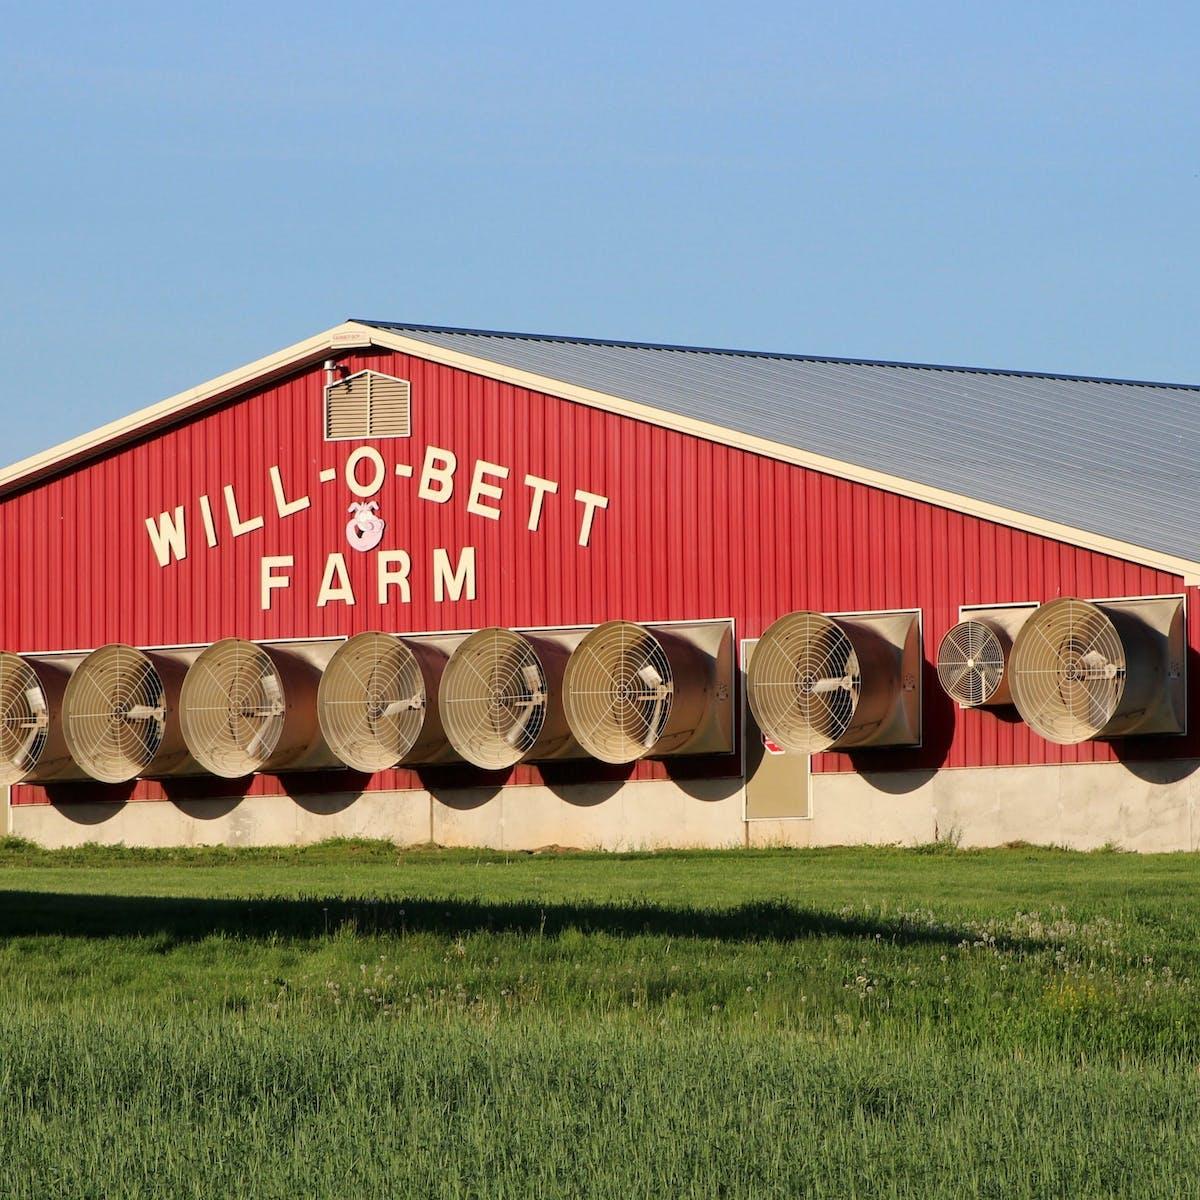 Rural Americans' struggles against factory farm pollution